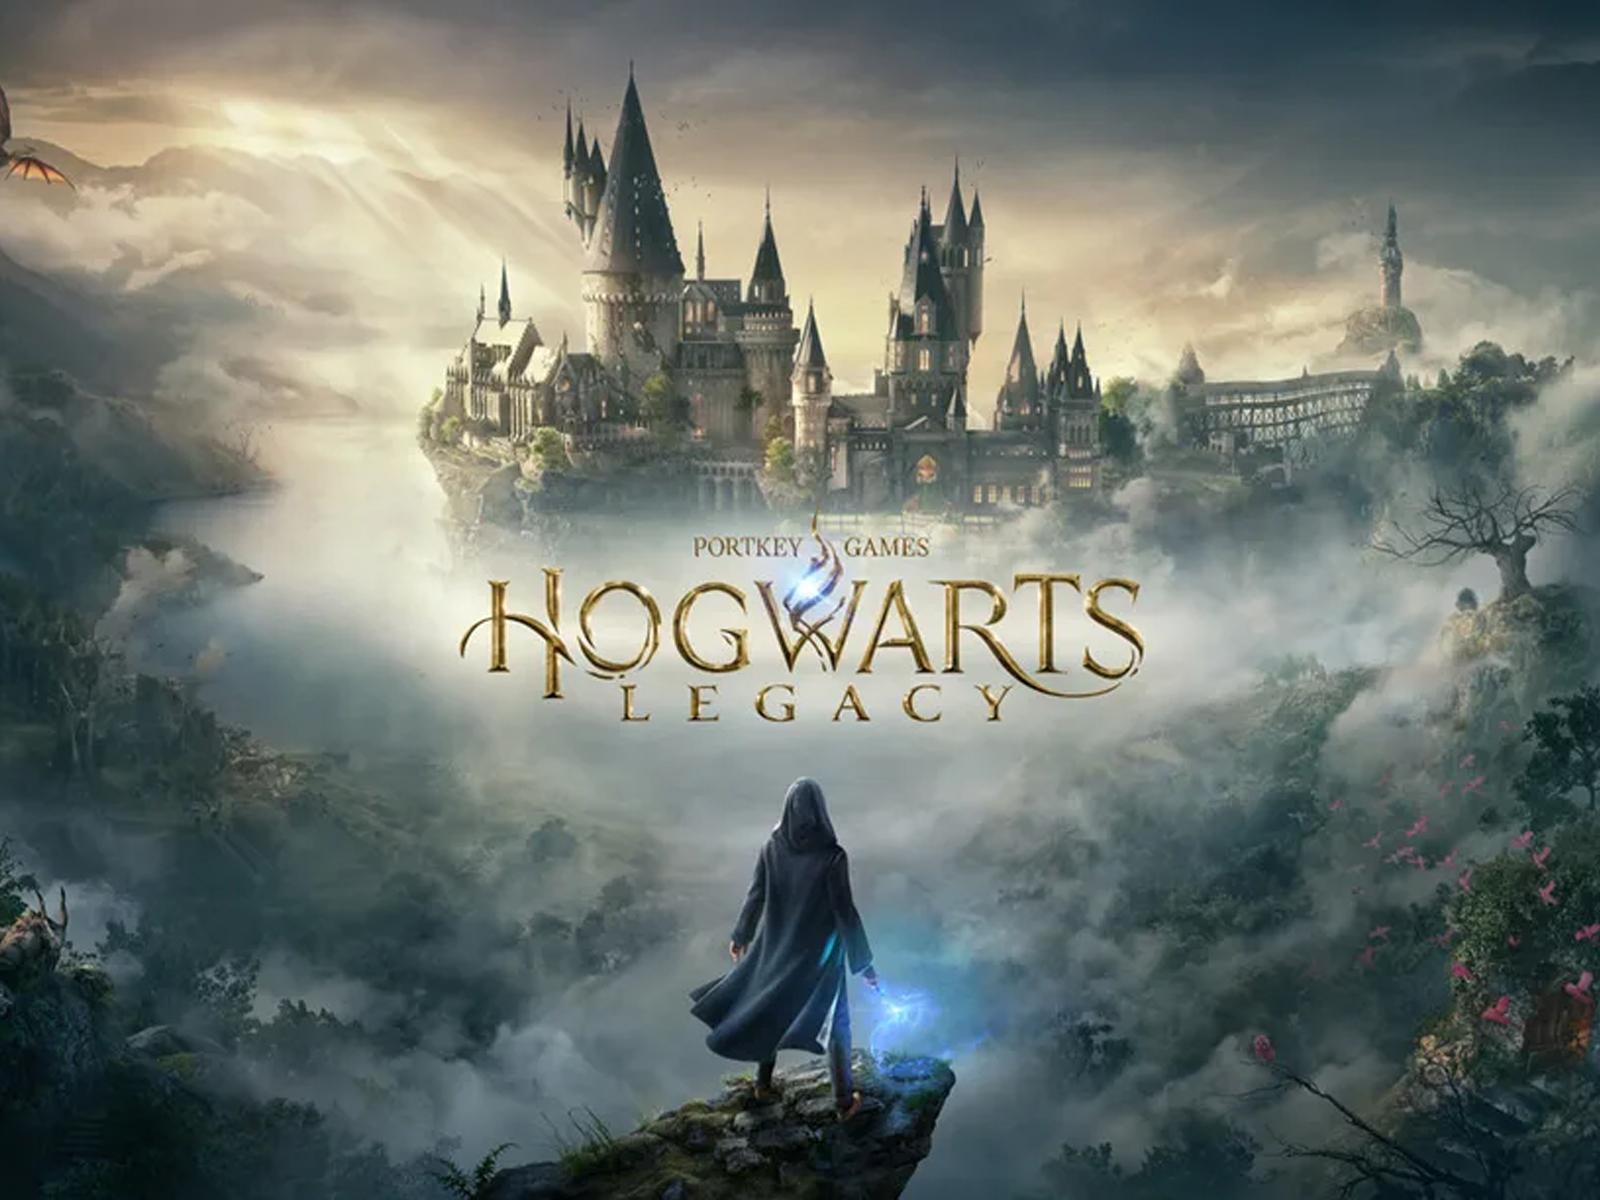 videogioco hogwarts legacy